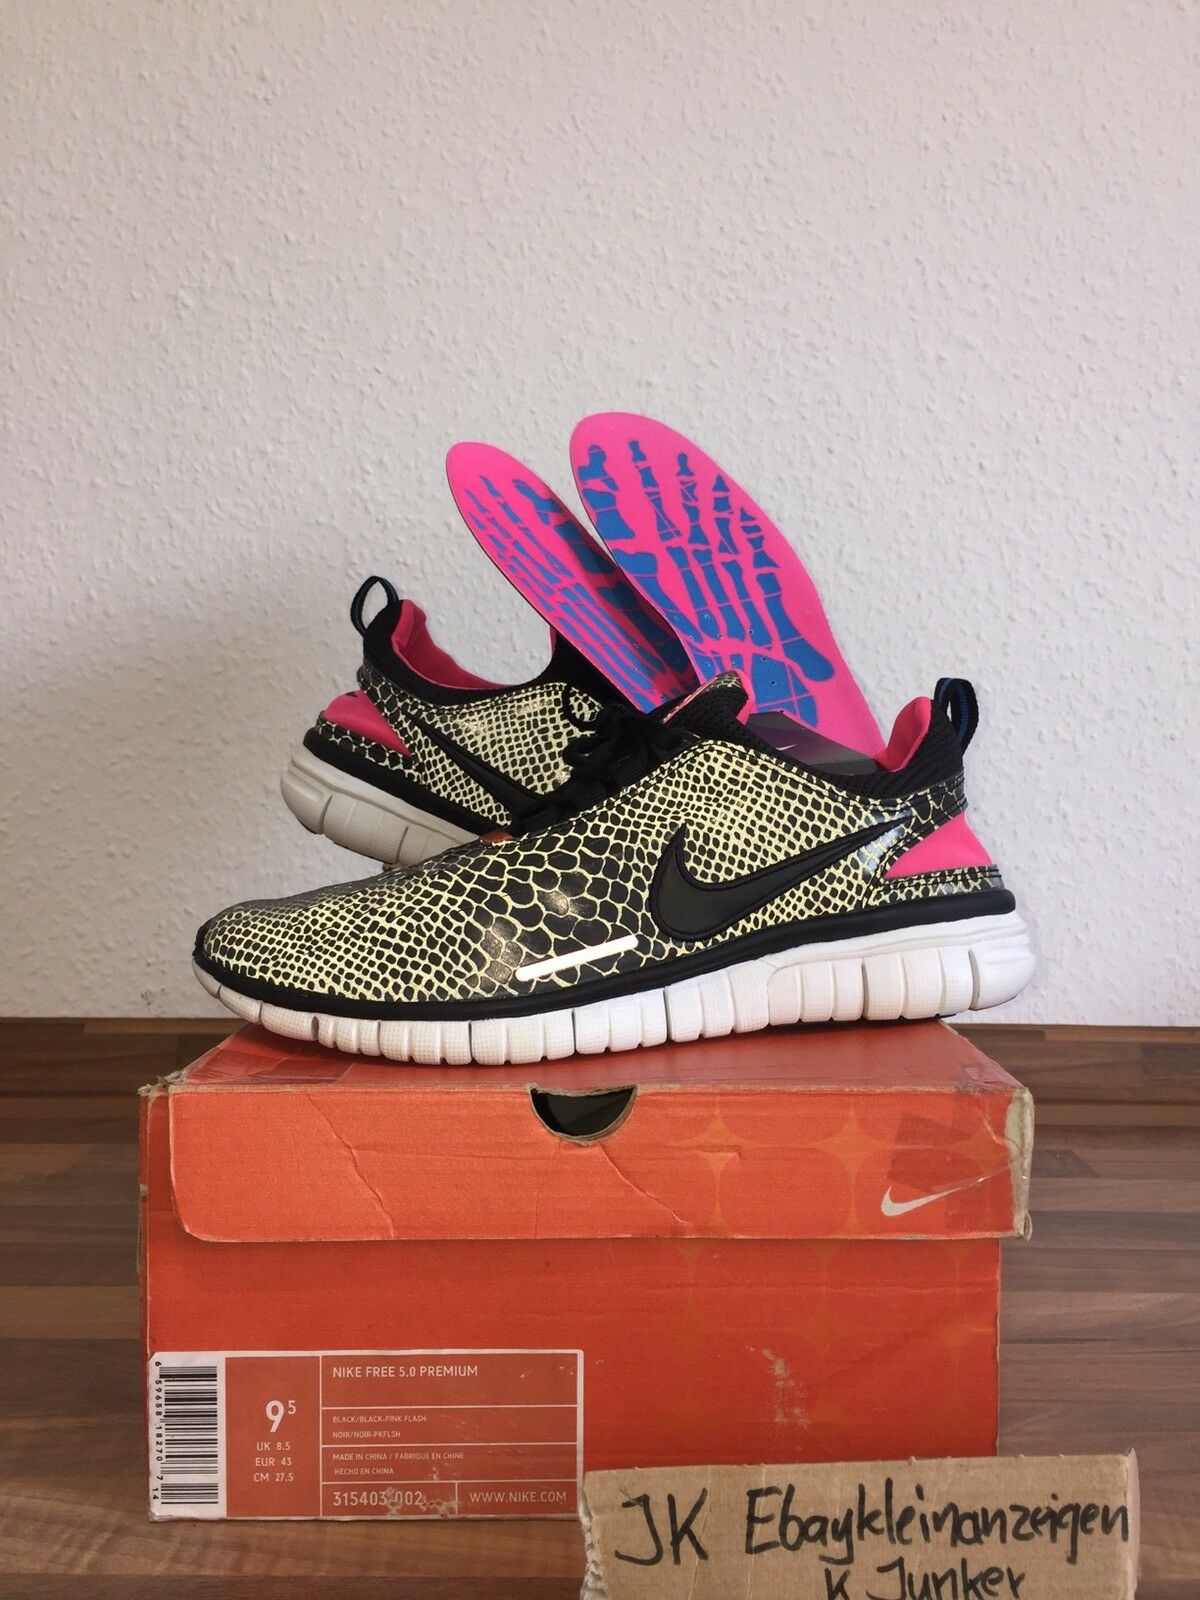 Nike Free 5.0 x Atmos 3M 9,5 43 Safari elephant air max jordan 1 react solebox 4